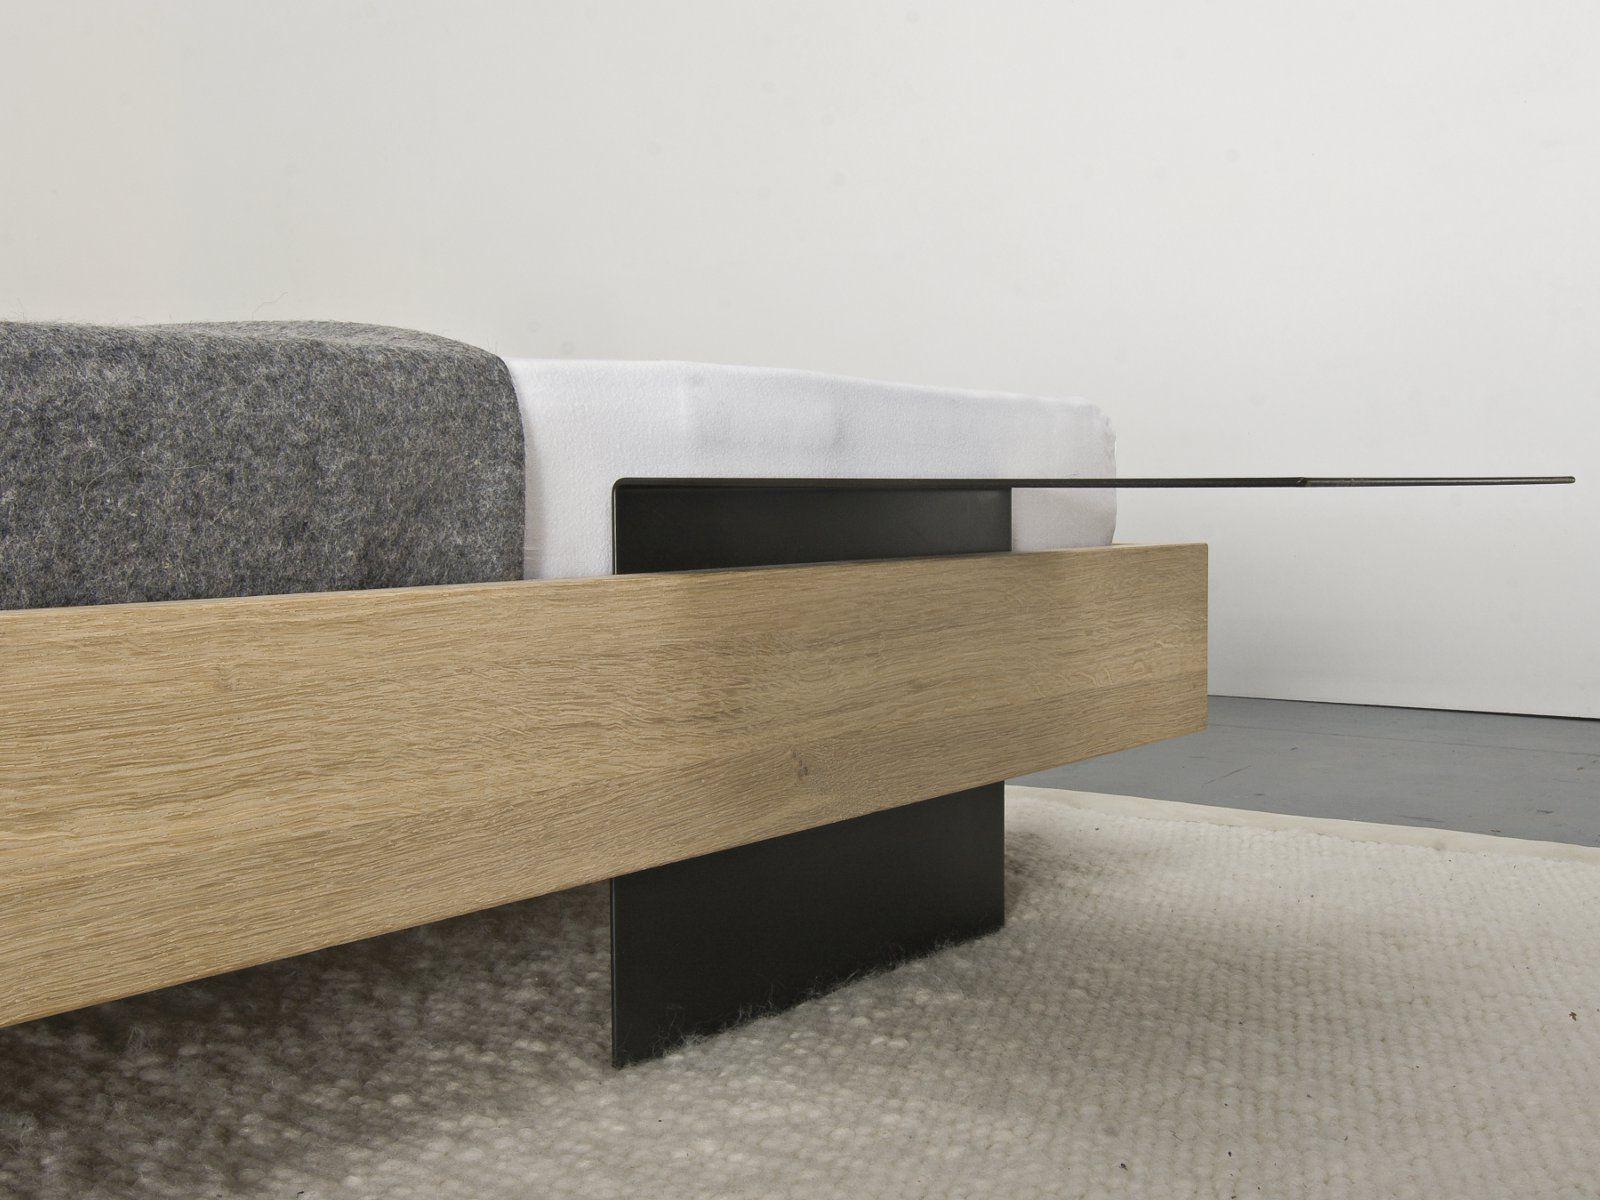 solid wood sofa bed iku by sanktjohanser design matthias